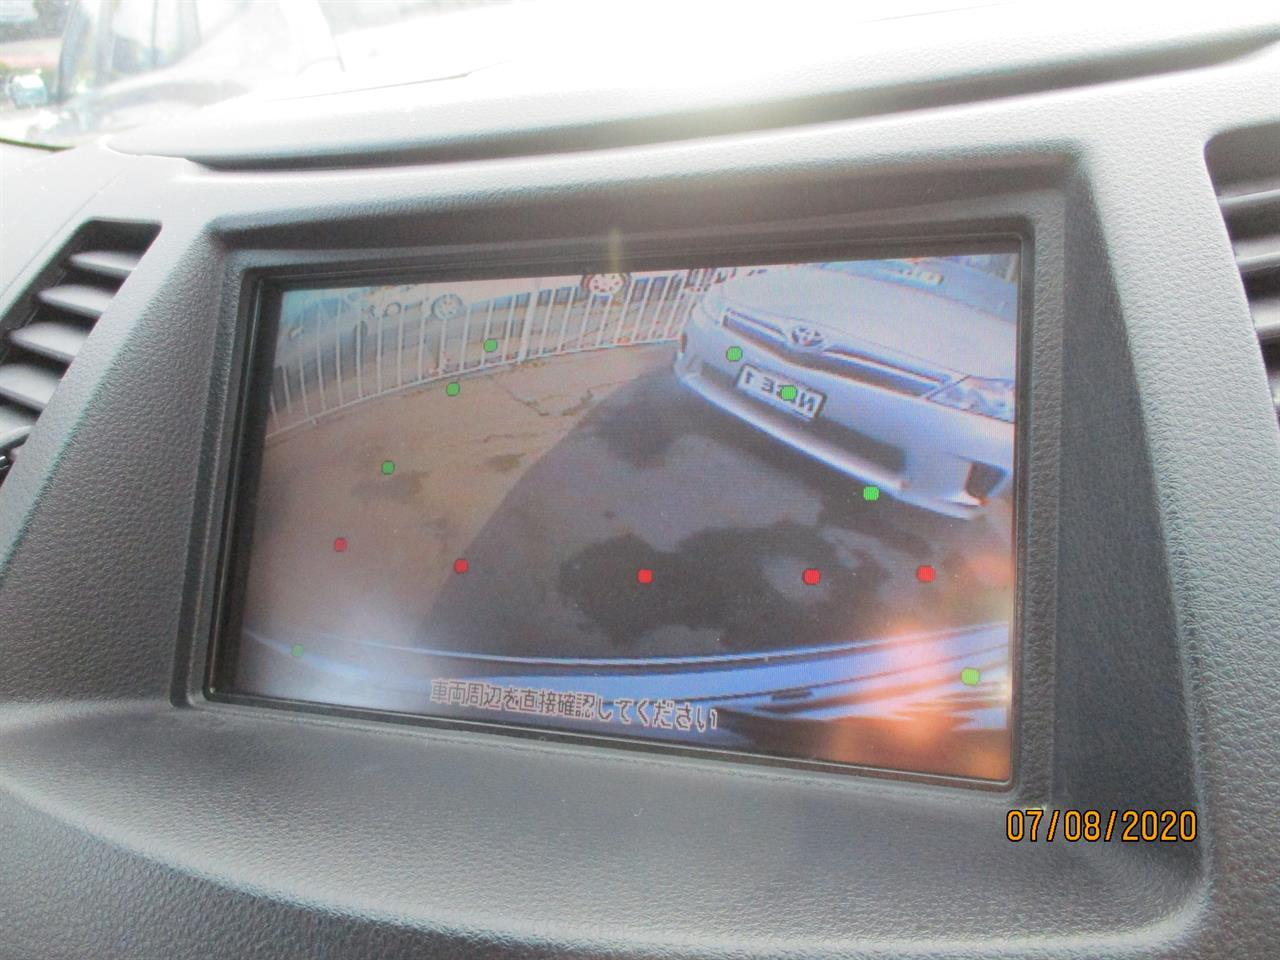 image-16, 2007 Mitsubishi Grandis 2.4 7 seater at Dunedin